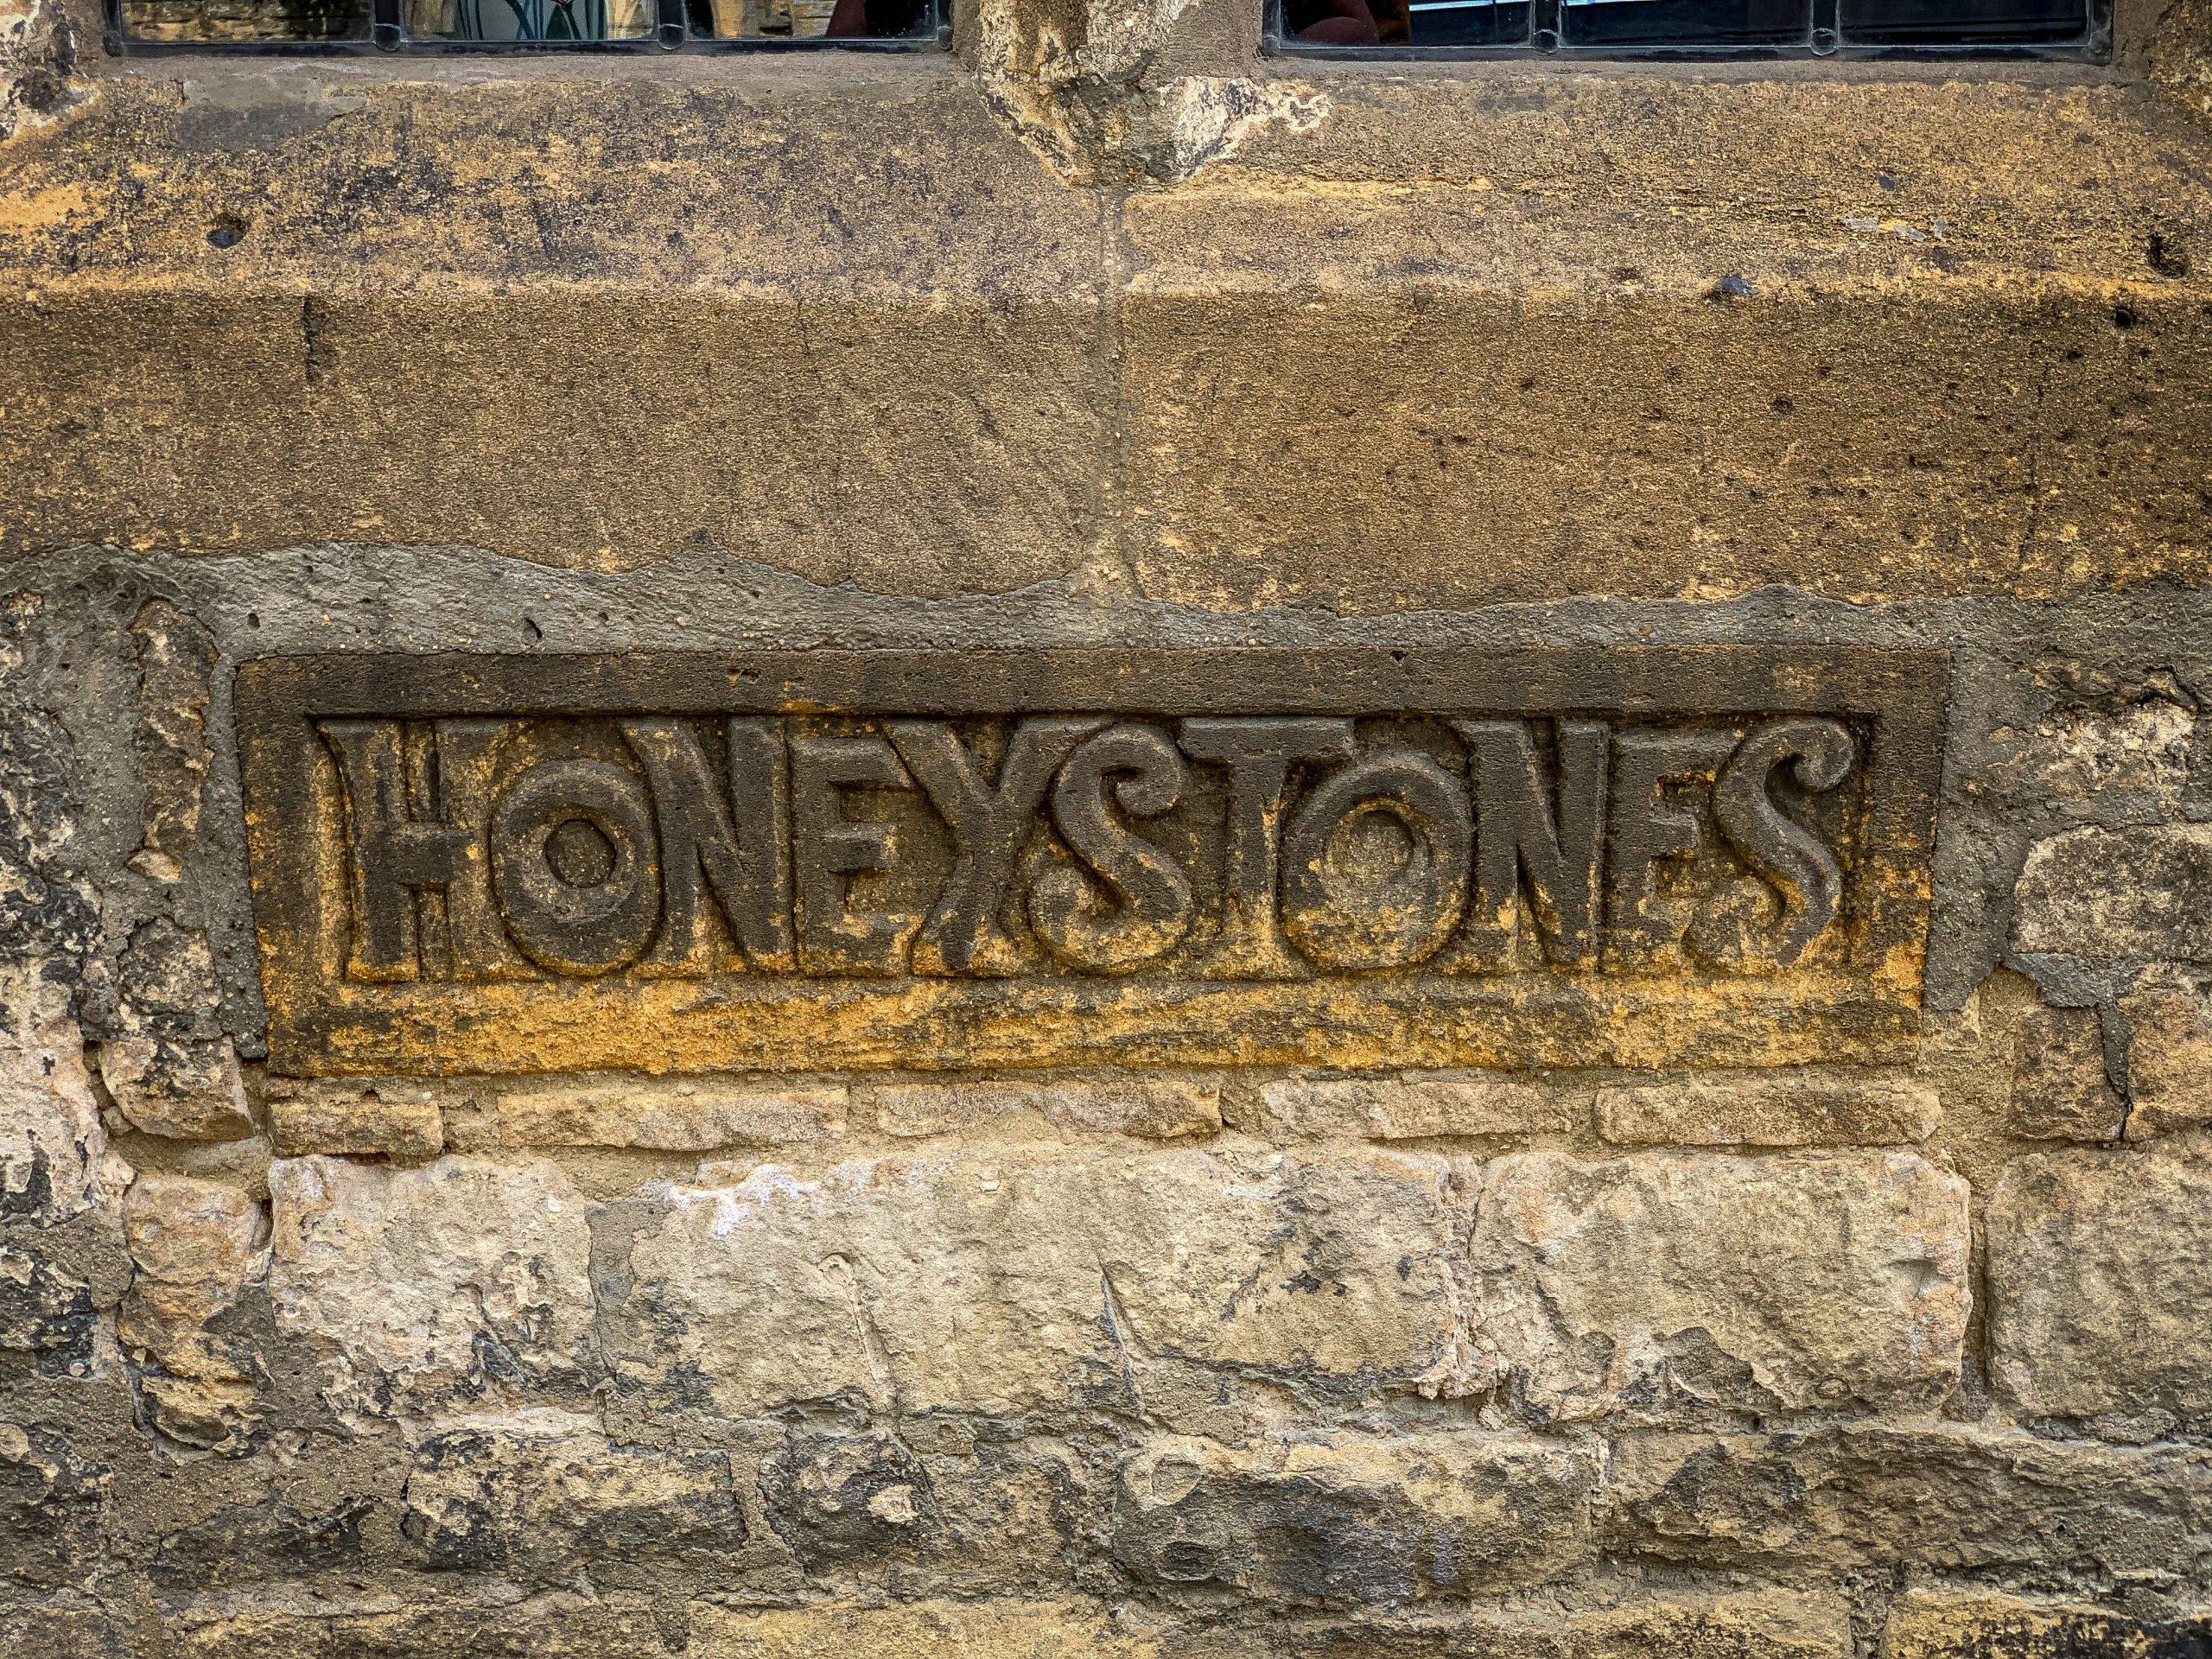 honeystones, Cotswolds pic: Kerstin rodgers/msmarmitelover.com